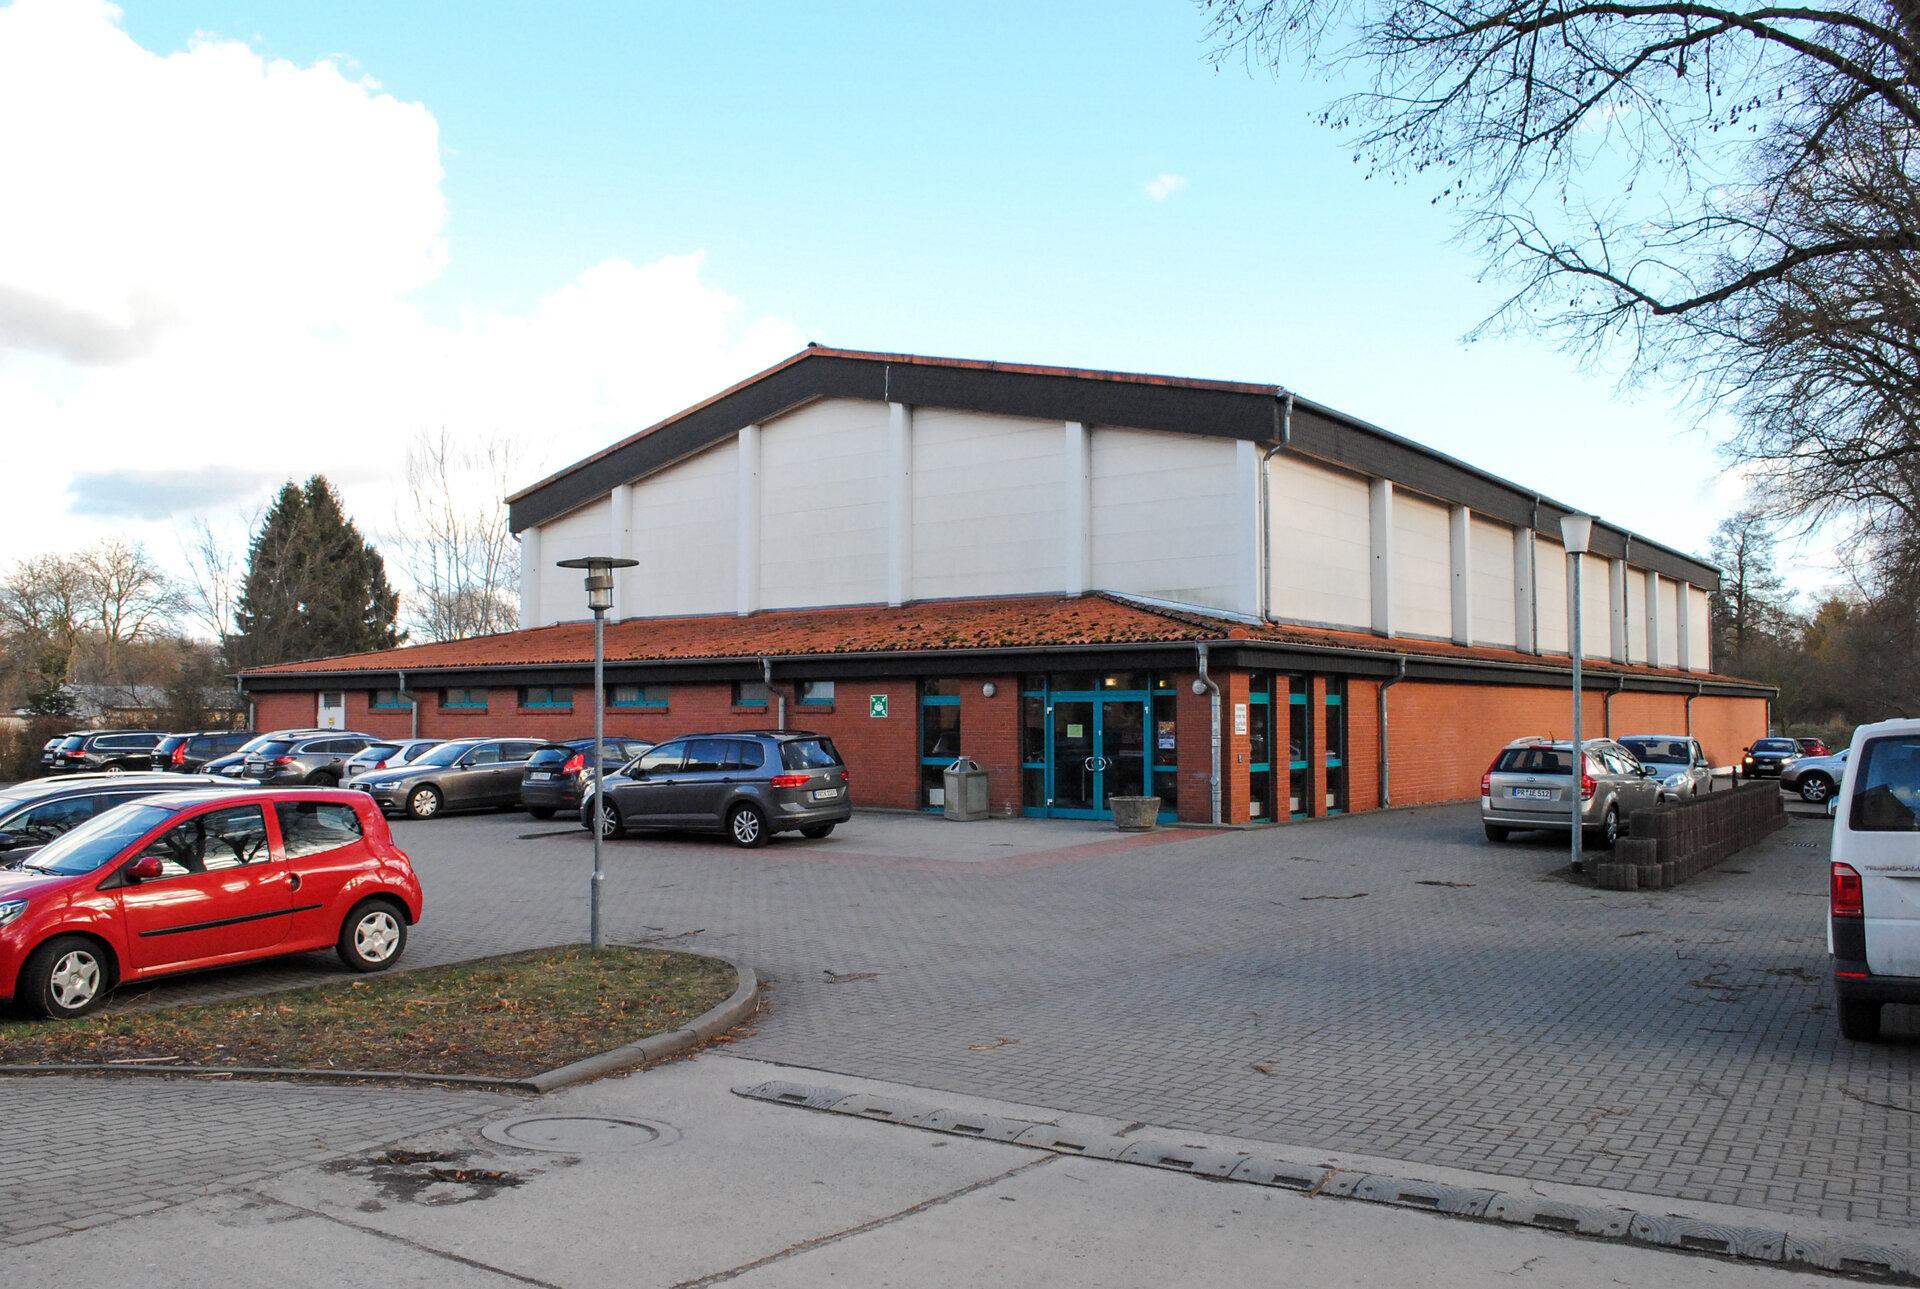 Turnhalle_Quandtschule